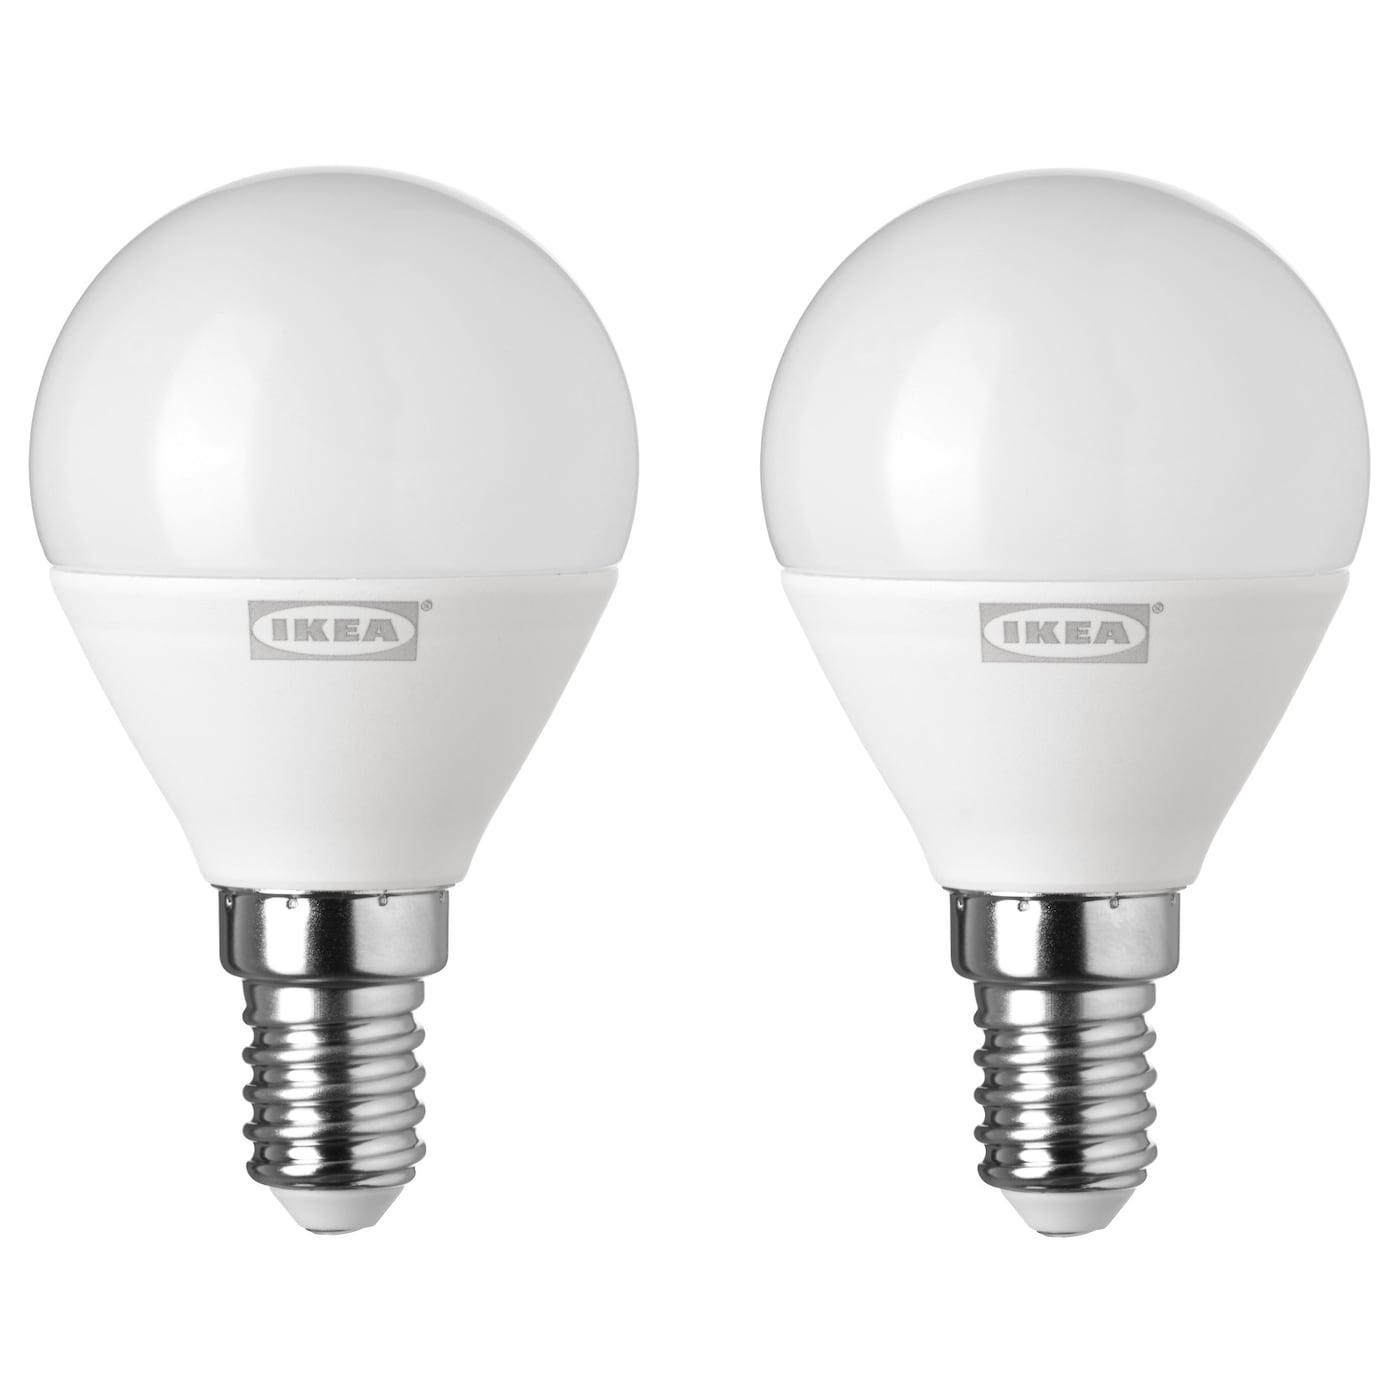 Lighting Amp Lamps Led Lighting Amp Lamps Ikea